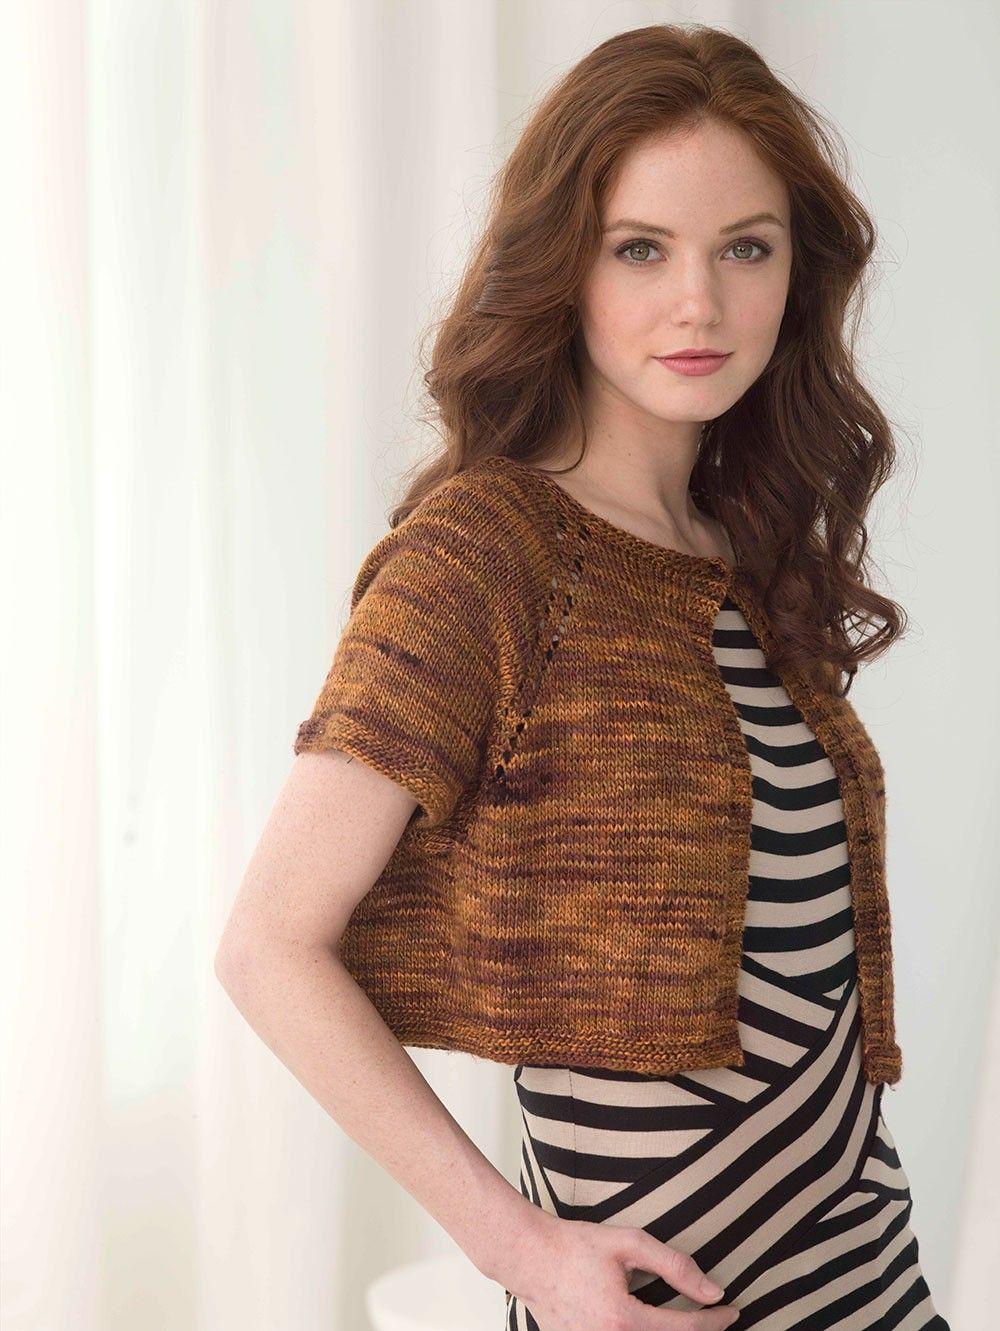 Simply Elegant Bolero Pattern (Knit) | Bolero pattern ...